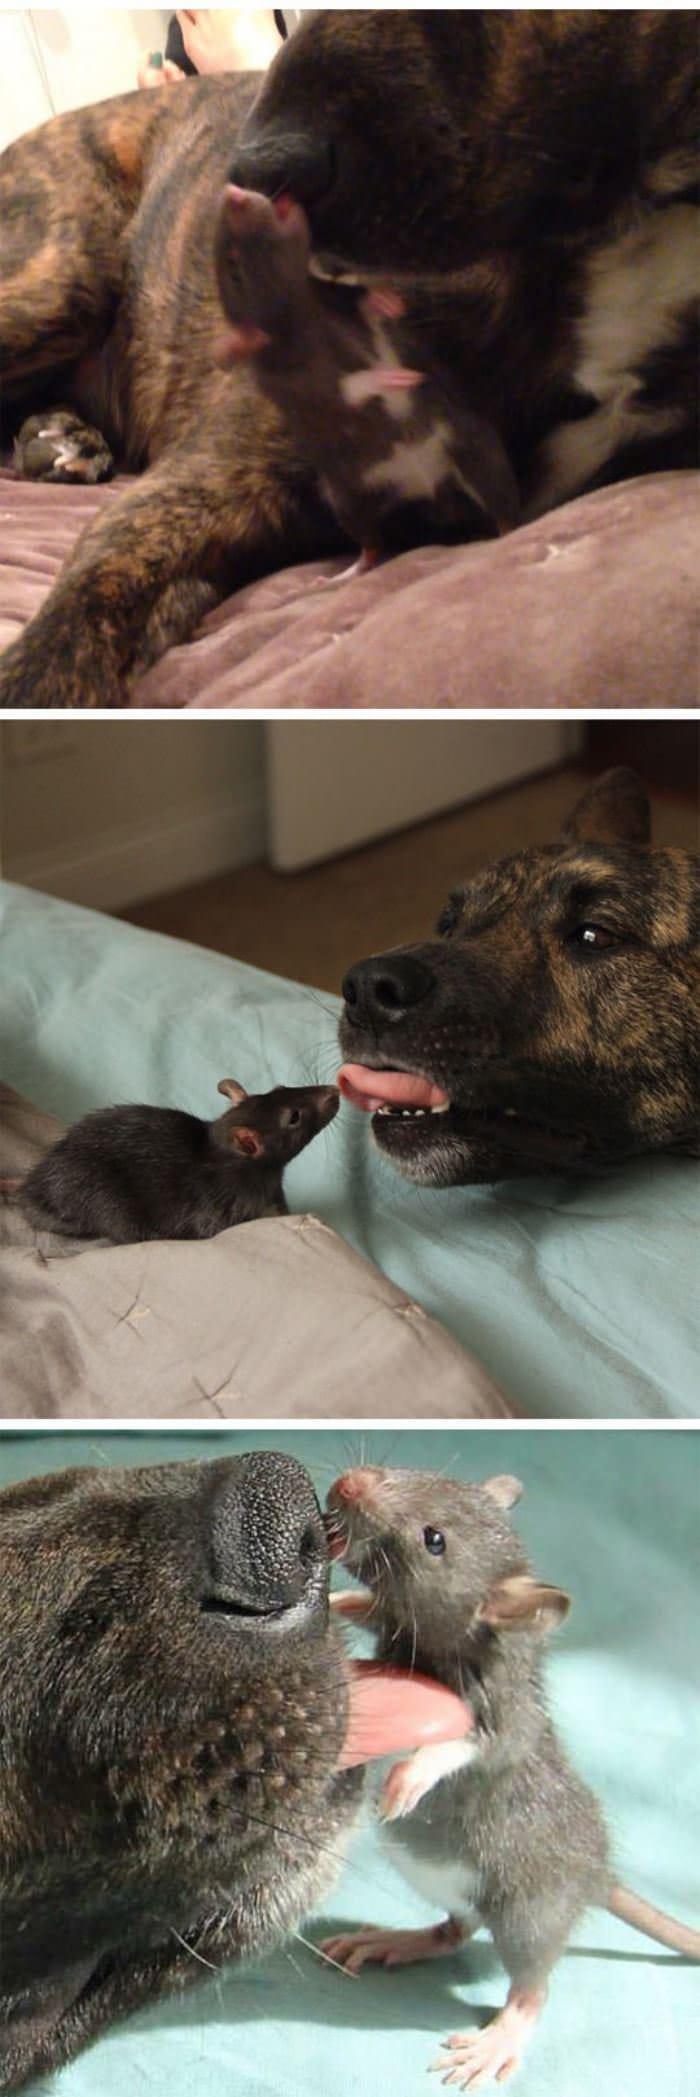 heavy-petting